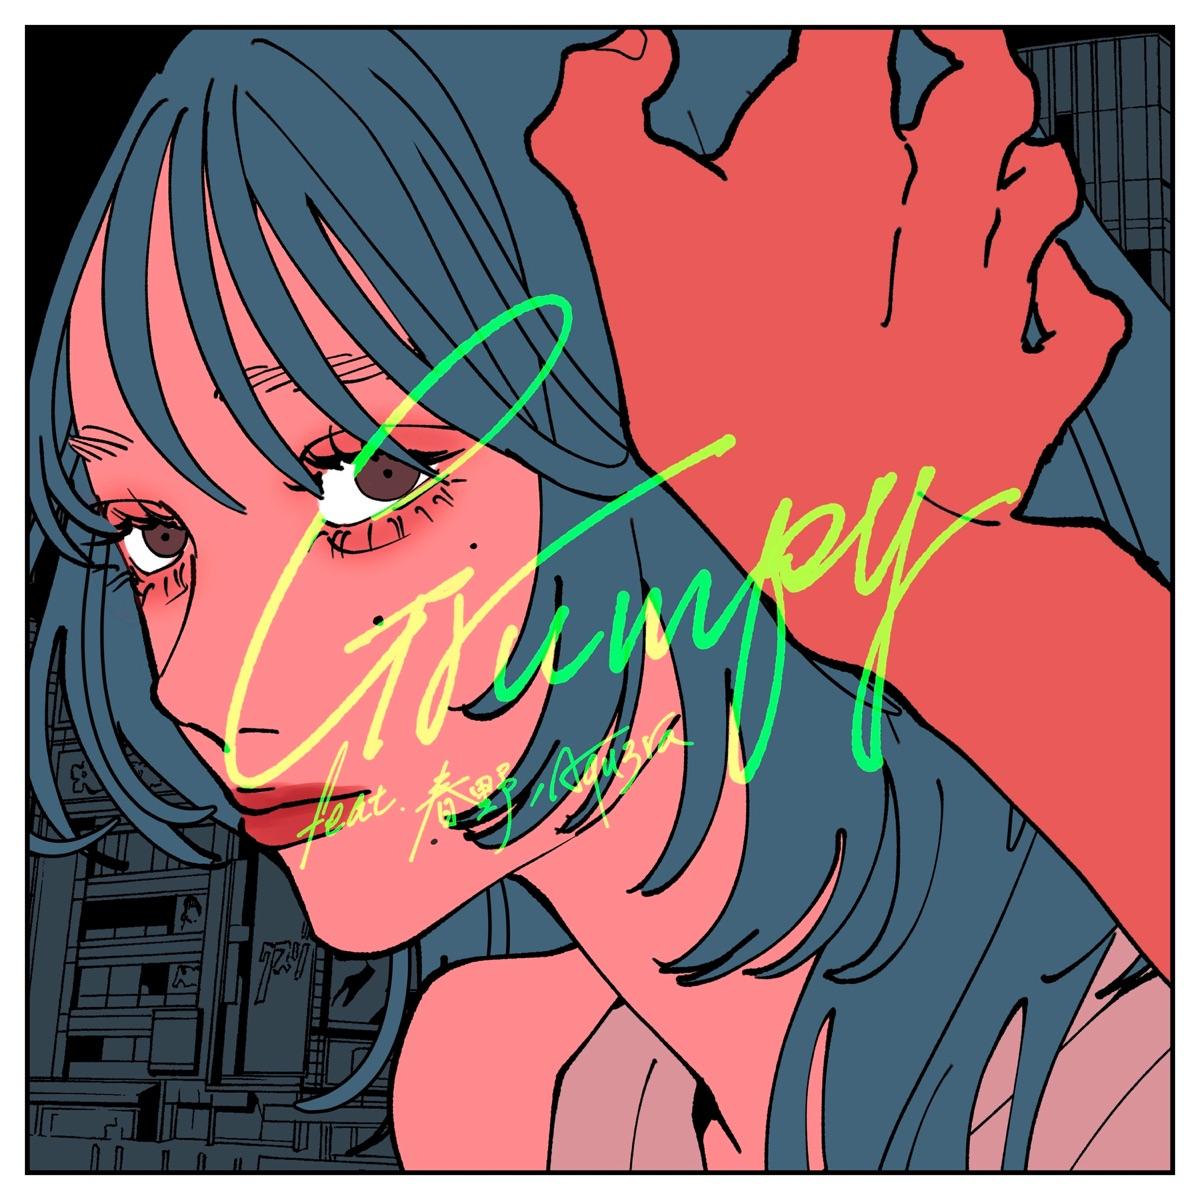 『MAISONdes - Grumpy (feat. 春野, Aqu3ra)』収録の『Grumpy (feat. 春野, Aqu3ra)』ジャケット